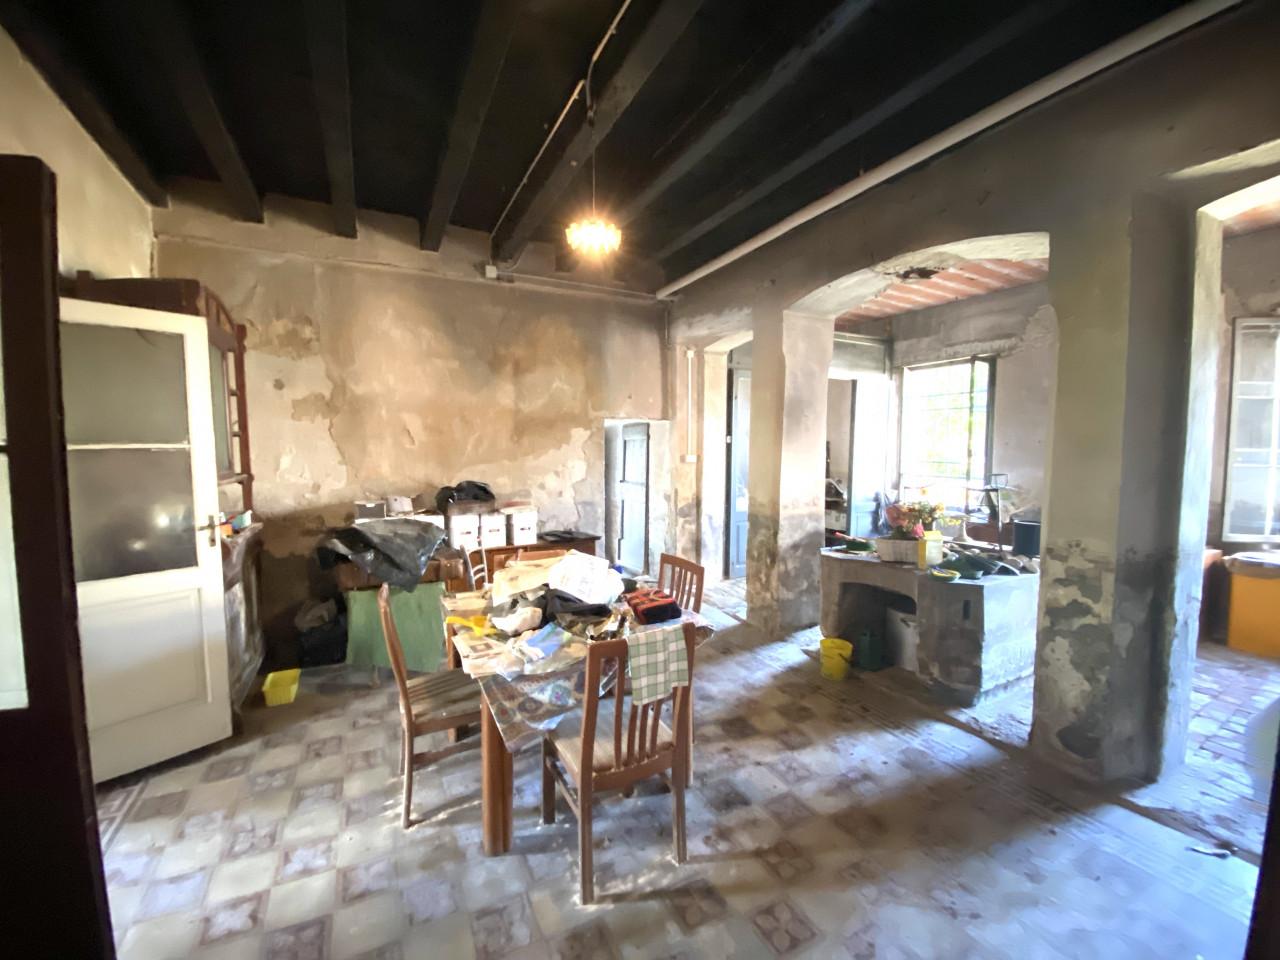 Dimora Storica in vendita in Centro a Valvasone - Rif.P1 https://images.gestionaleimmobiliare.it/foto/annunci/200820/2282895/1280x1280/018__img_3550.jpg